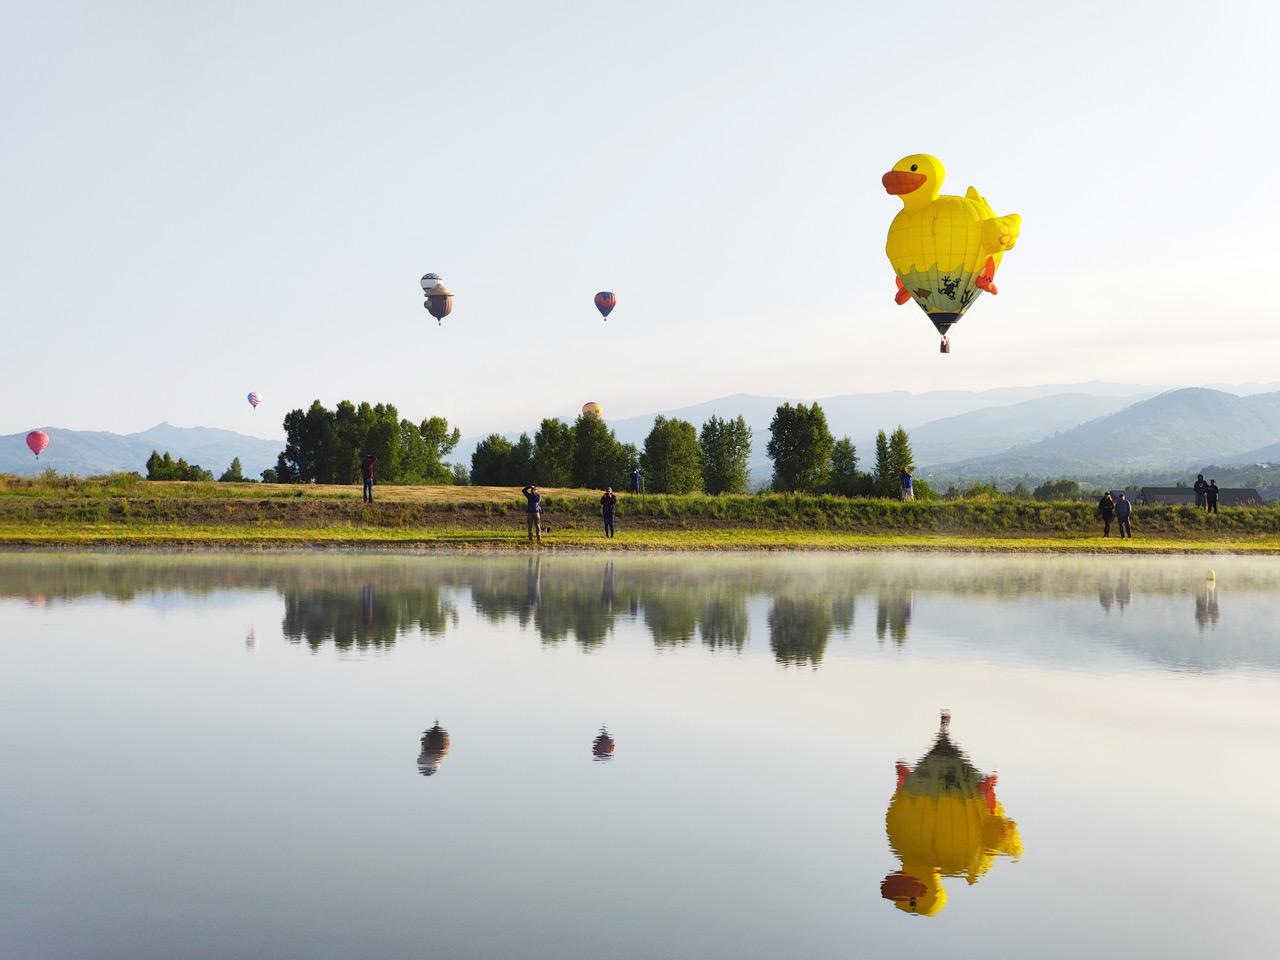 Balloon-festival-steamboat-springs